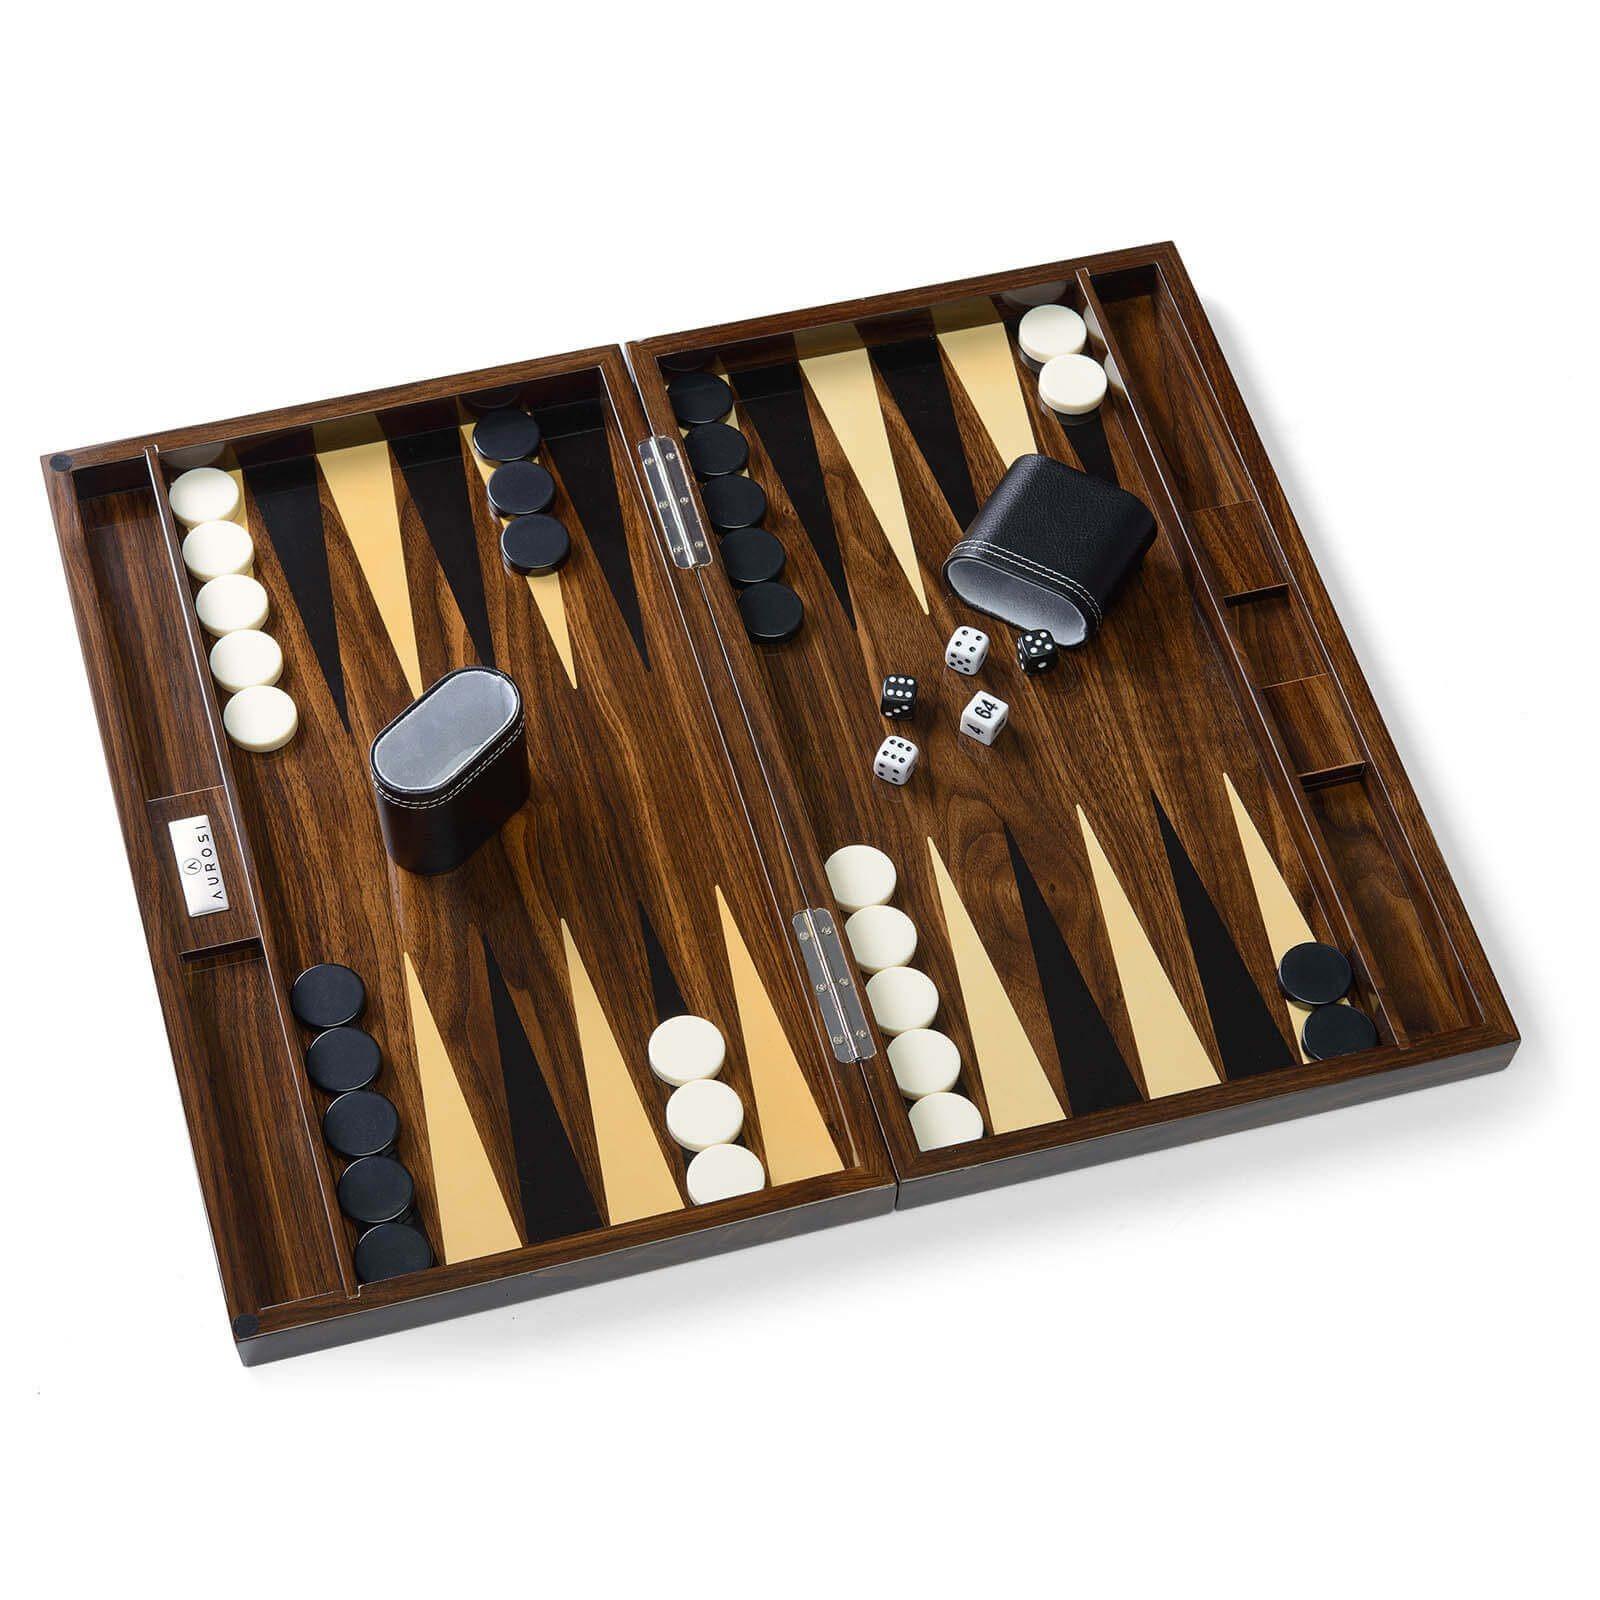 Wood Grain Lacquer Backgammon Set Open